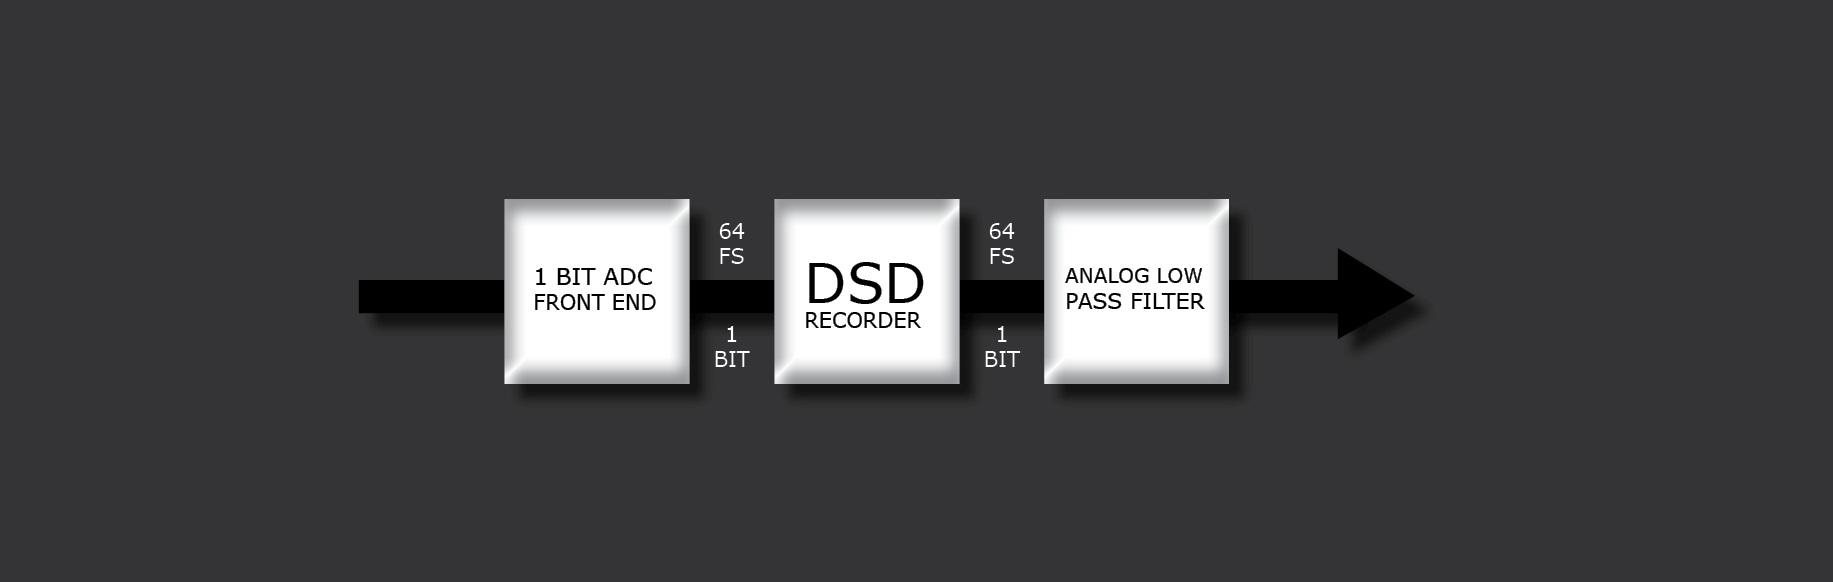 DSD – Jewels concealed behind the scarlet book | AudioPhile Linux